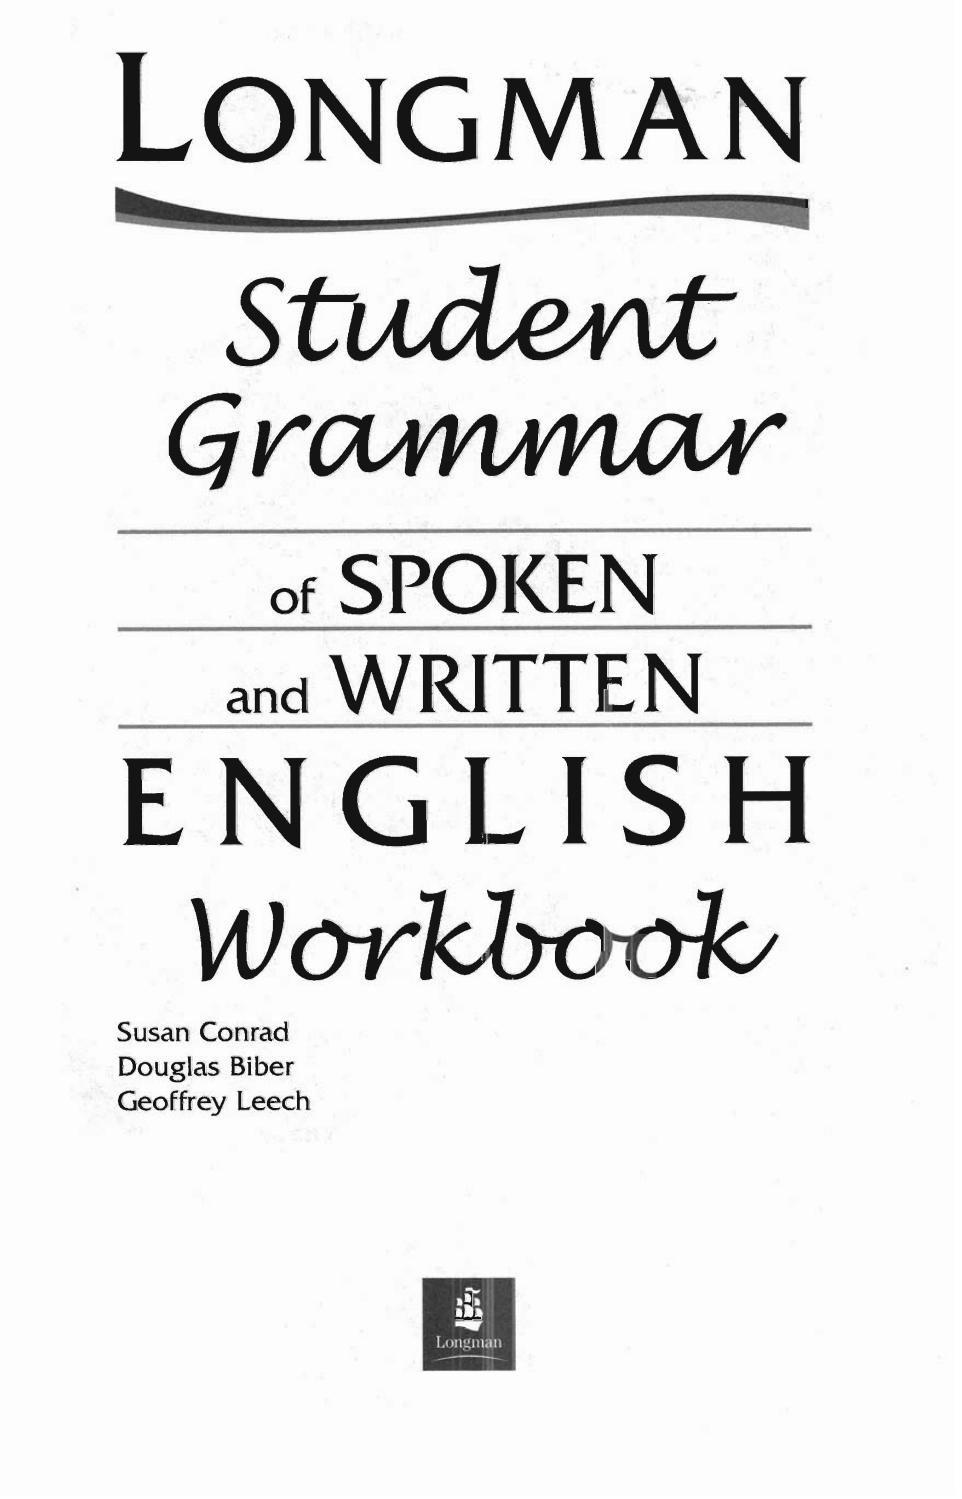 Student grammar of spoken and writtern english workbook